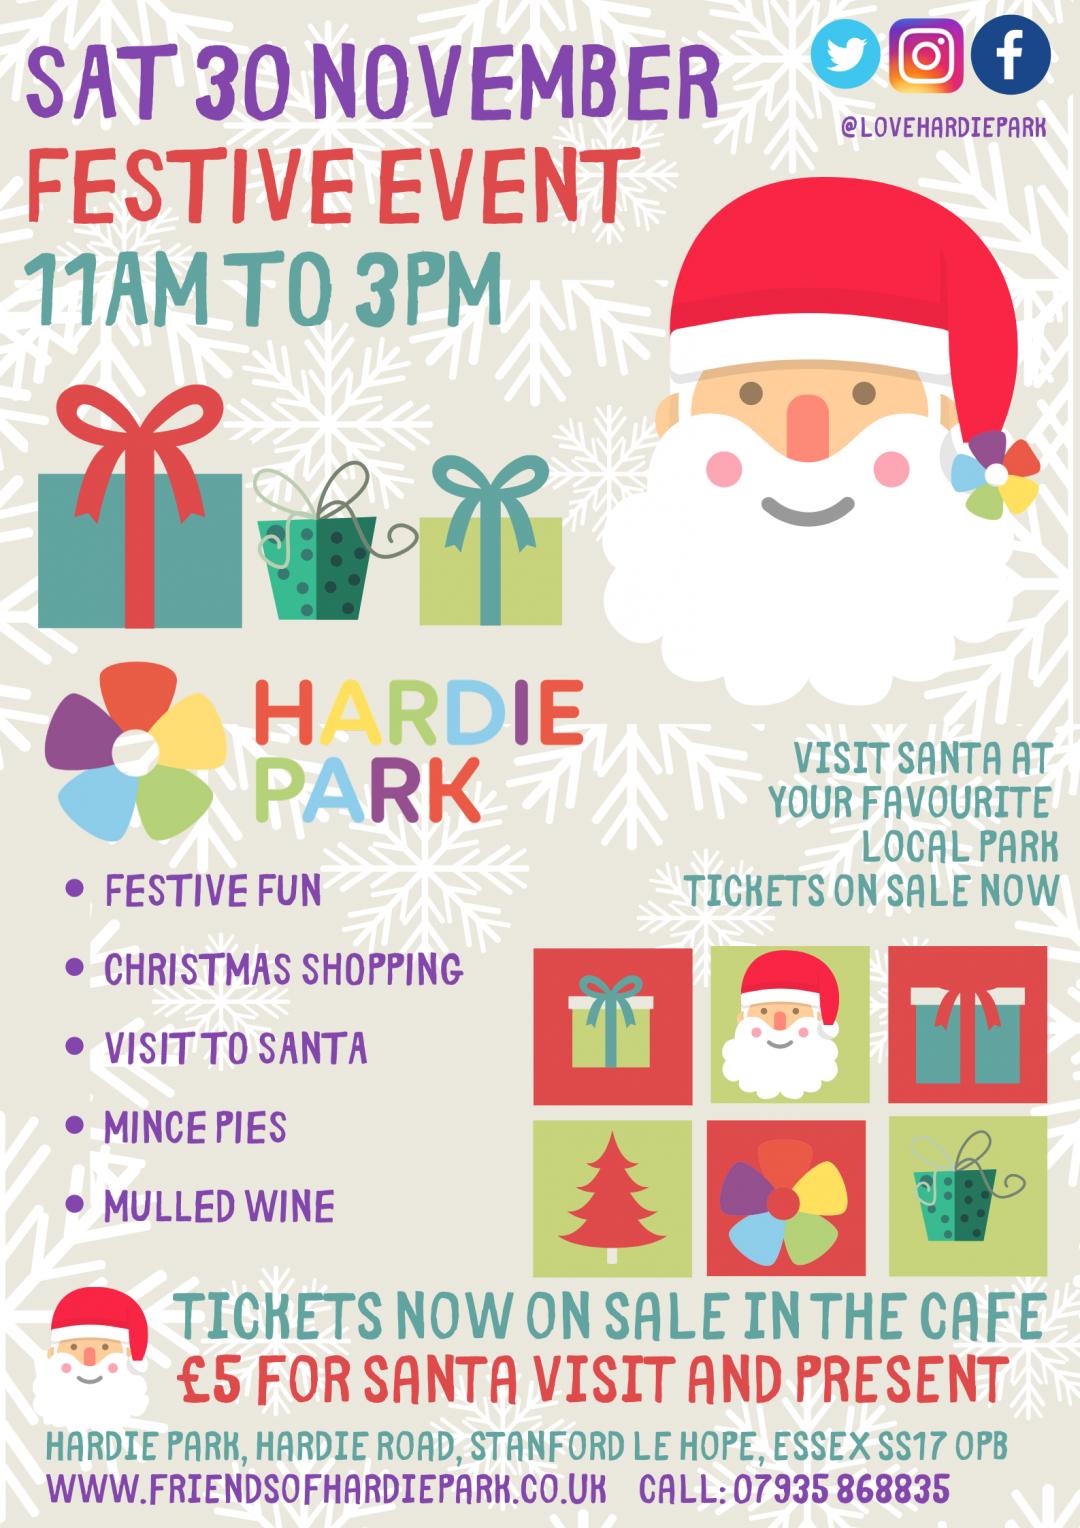 https://www.friendsofhardiepark.co.uk/christmas-stalls-santa_claus/